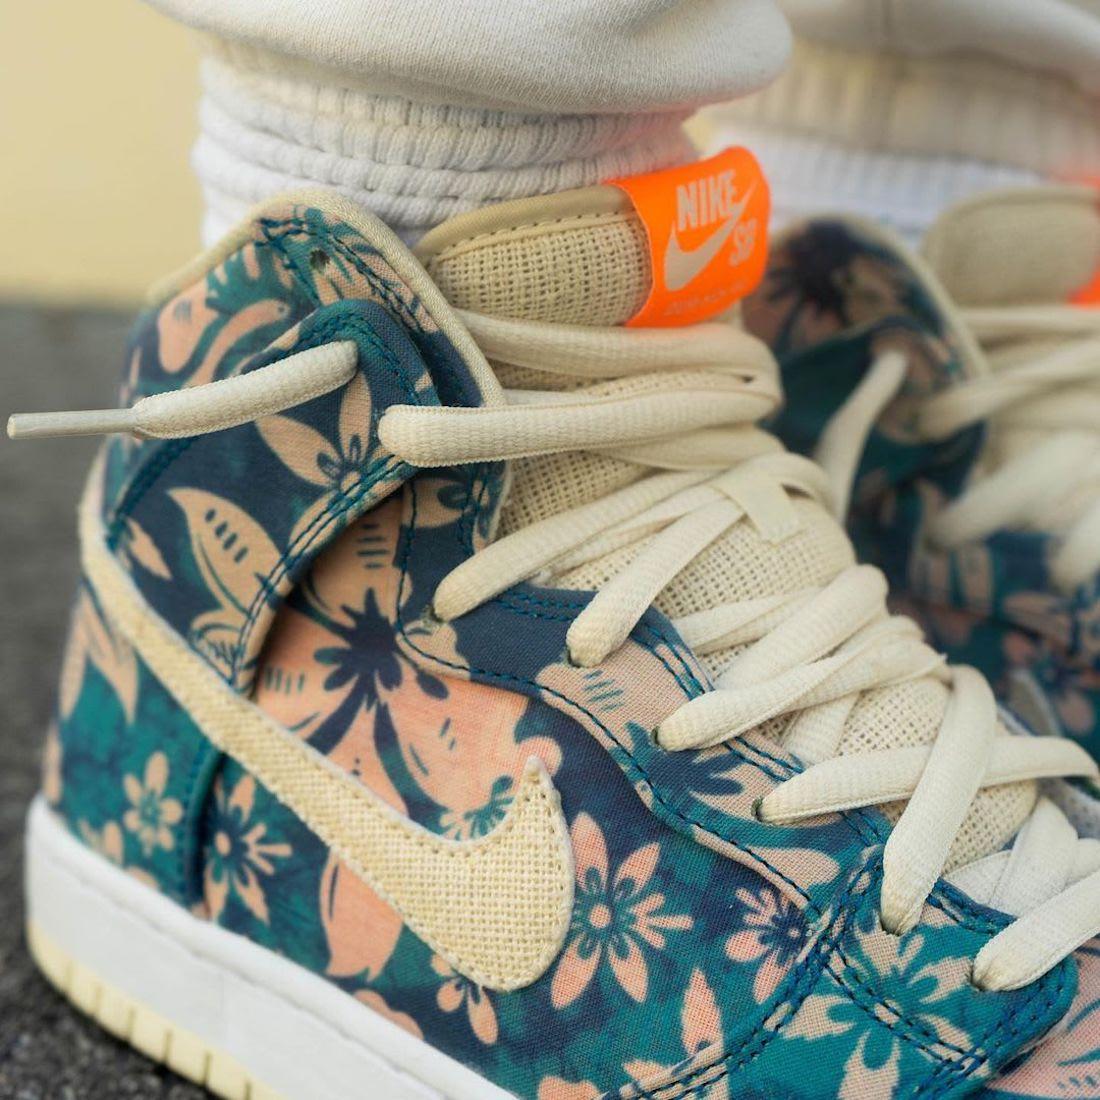 Nike SB Dunk High Hawaii CZ2232-300 Release Date Info